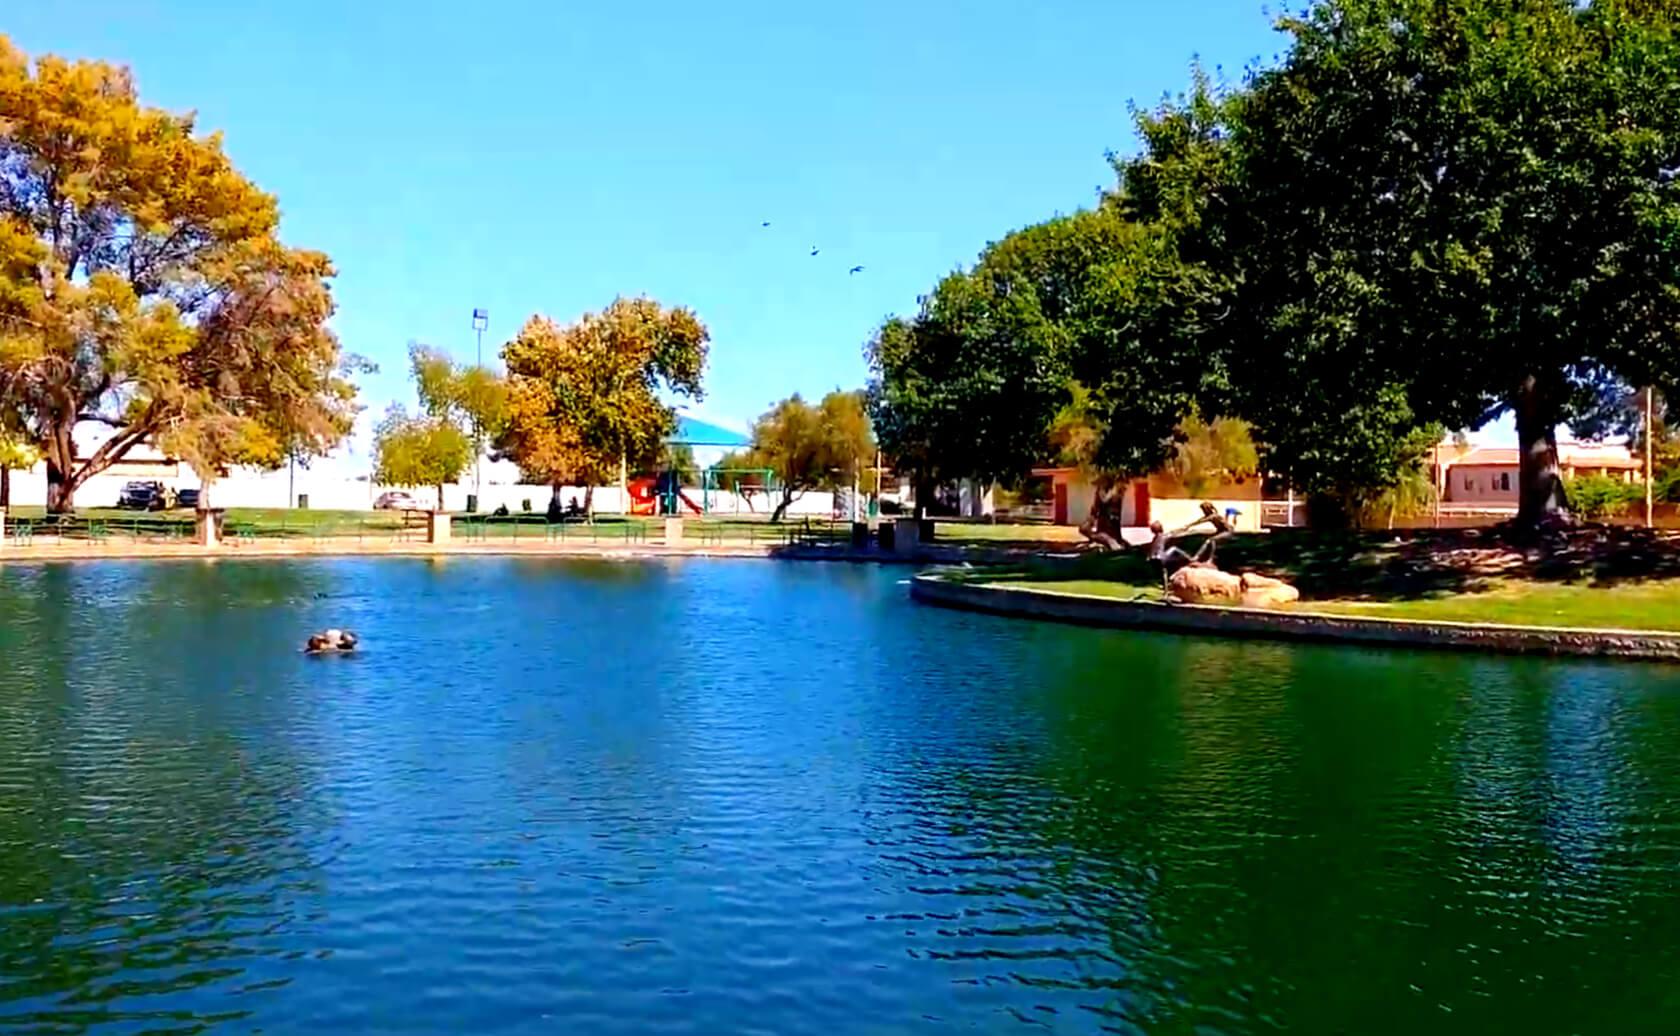 Bonsall-Pond-Lake-Fishing-Guide-Report-Glendale-AZ-02